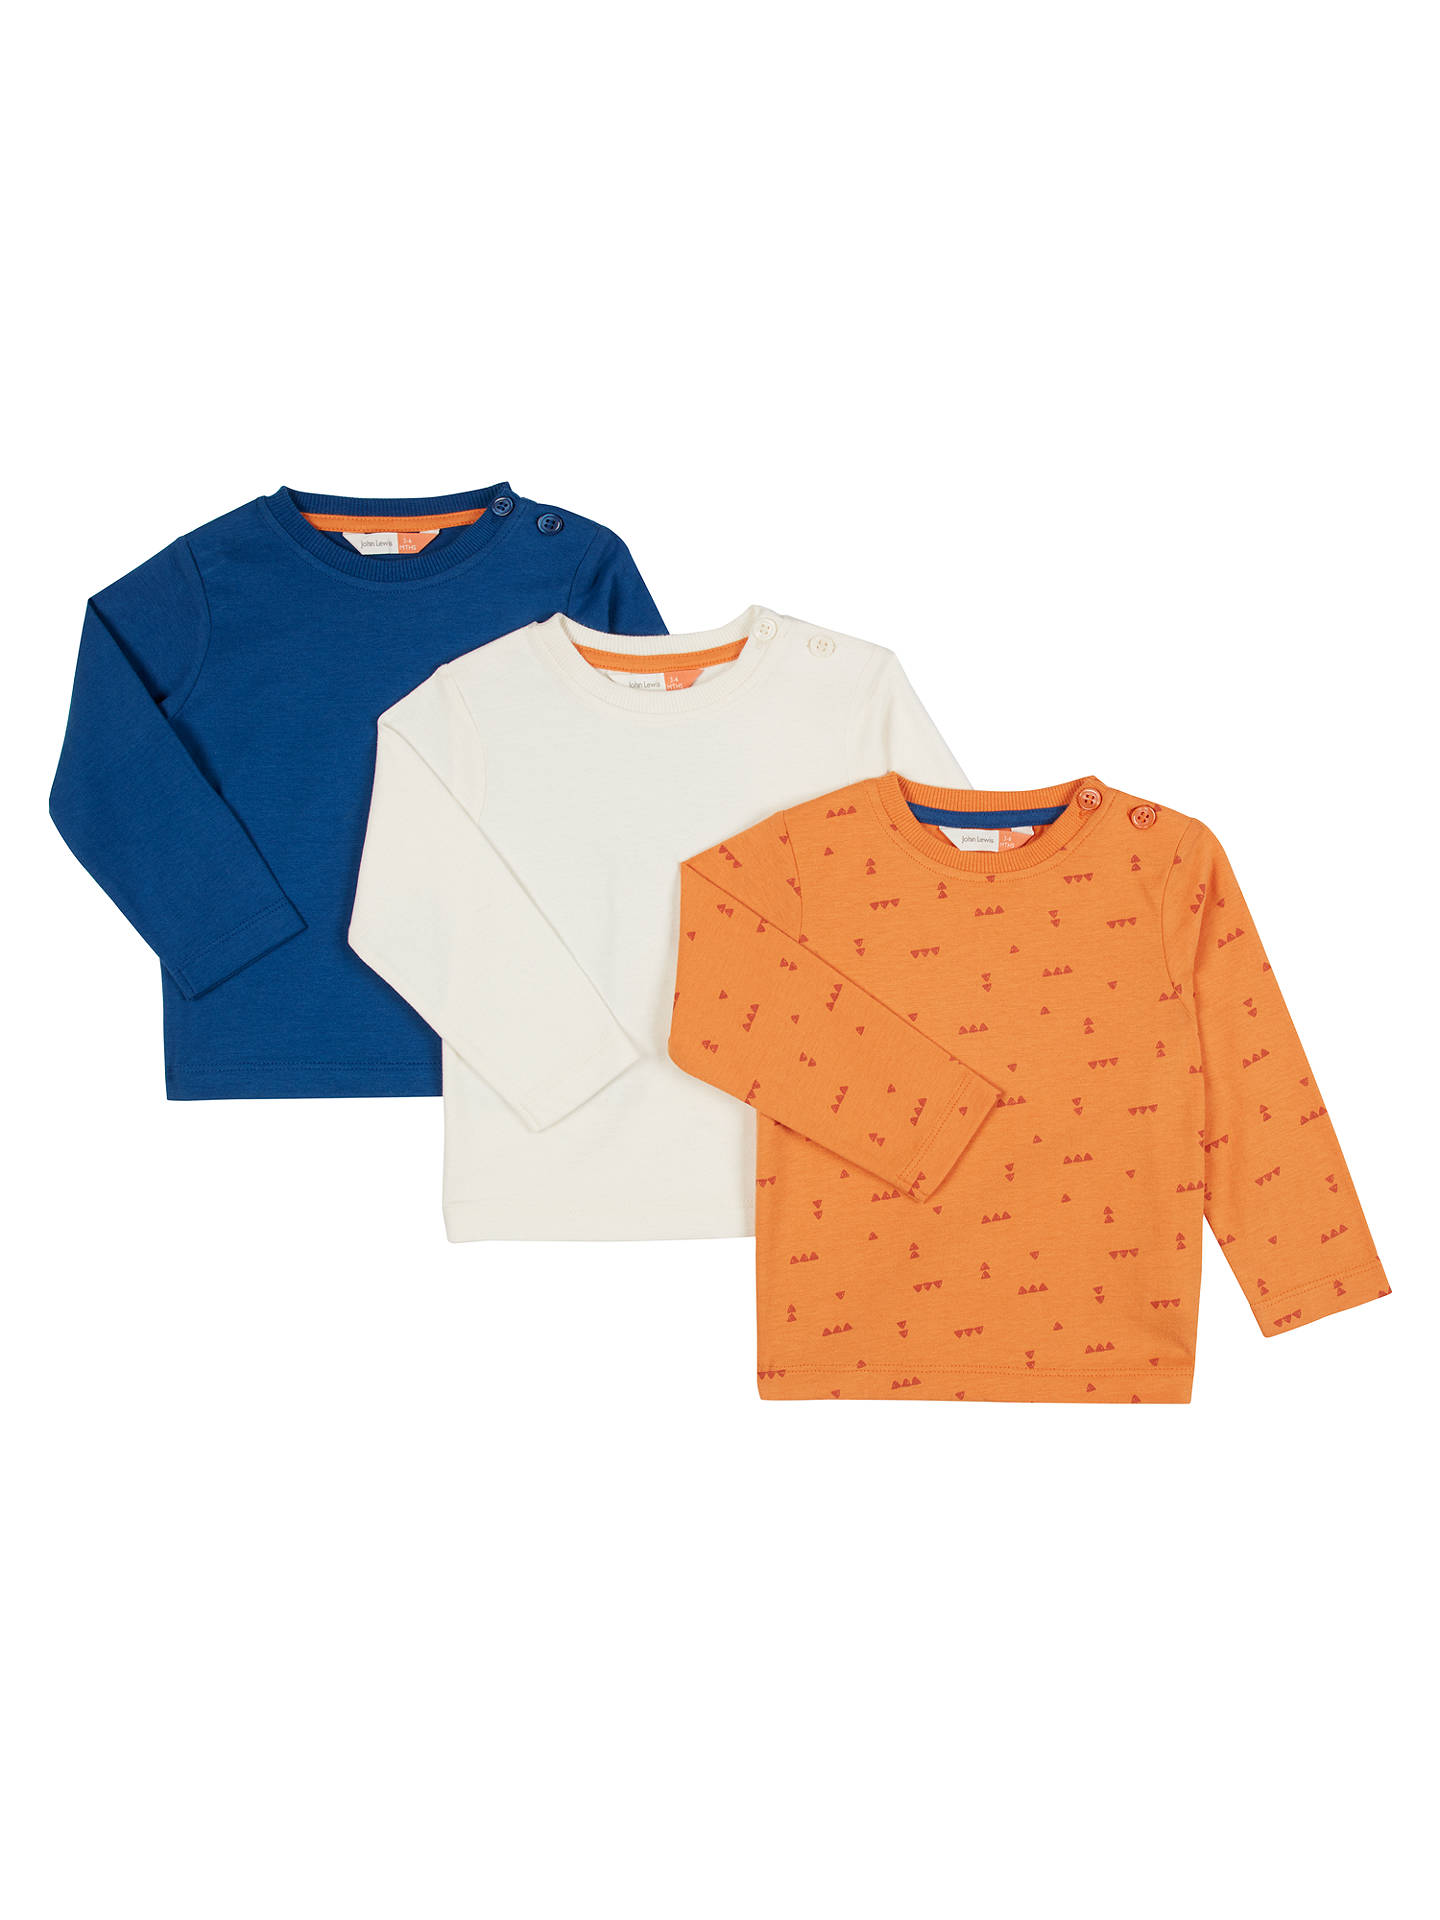 BuyJohn Lewis Baby Long Sleeve Cotton T-Shirts f56ebfaad04